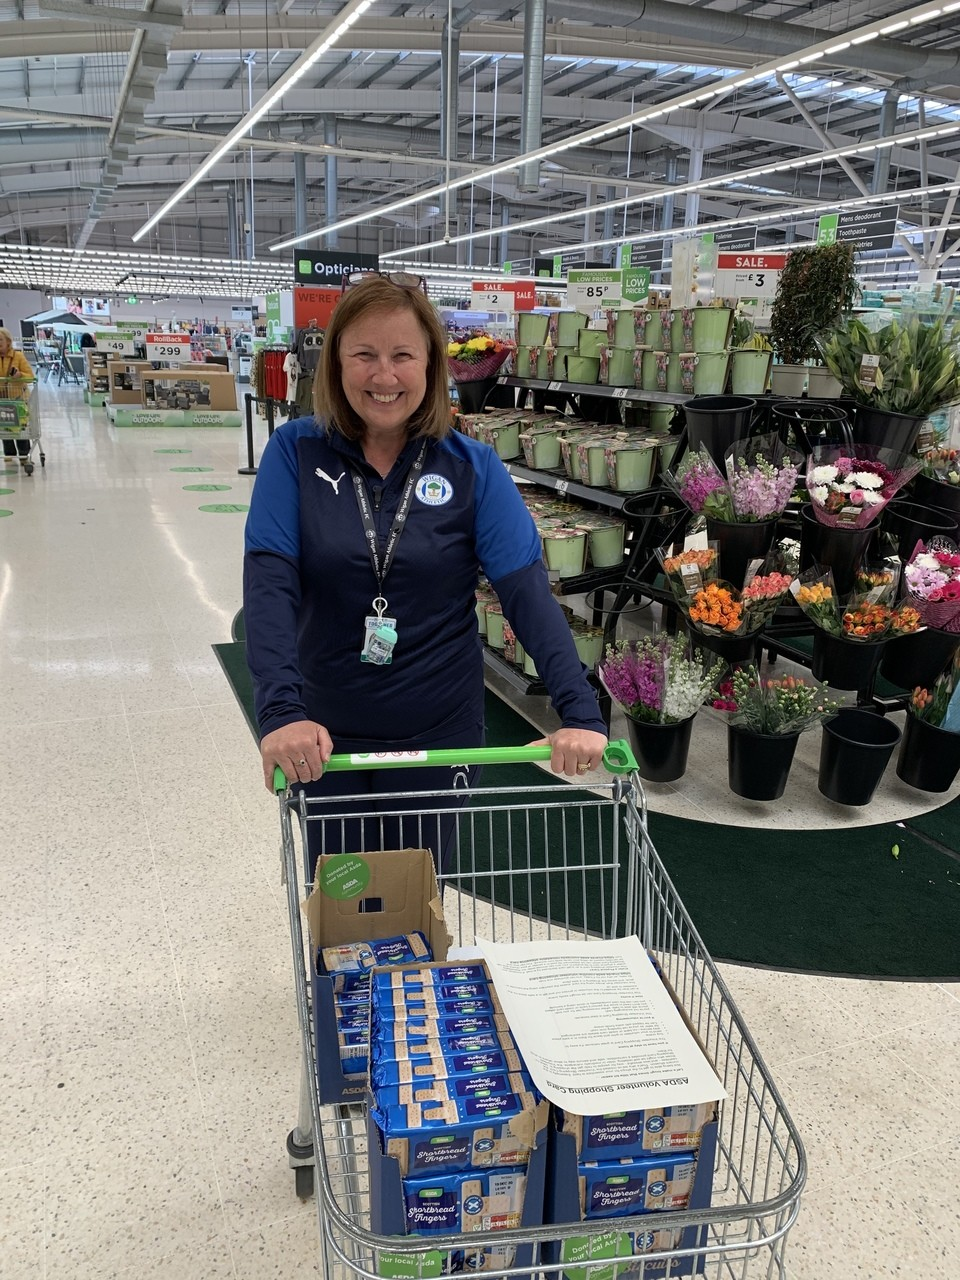 Biscuit donation | Asda Wigan